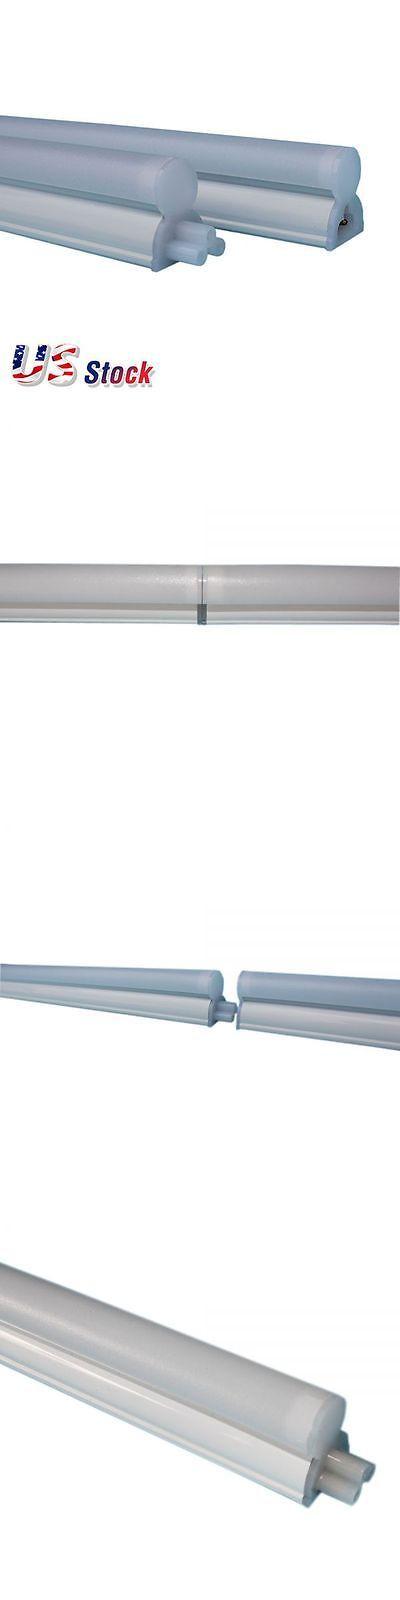 Light Bulbs 20706: 25Pcs* White* T5 15W 4Ft Led Tube Light Bulb Fluorescent Replacement Lamp -> BUY IT NOW ONLY: $128.7 on eBay!